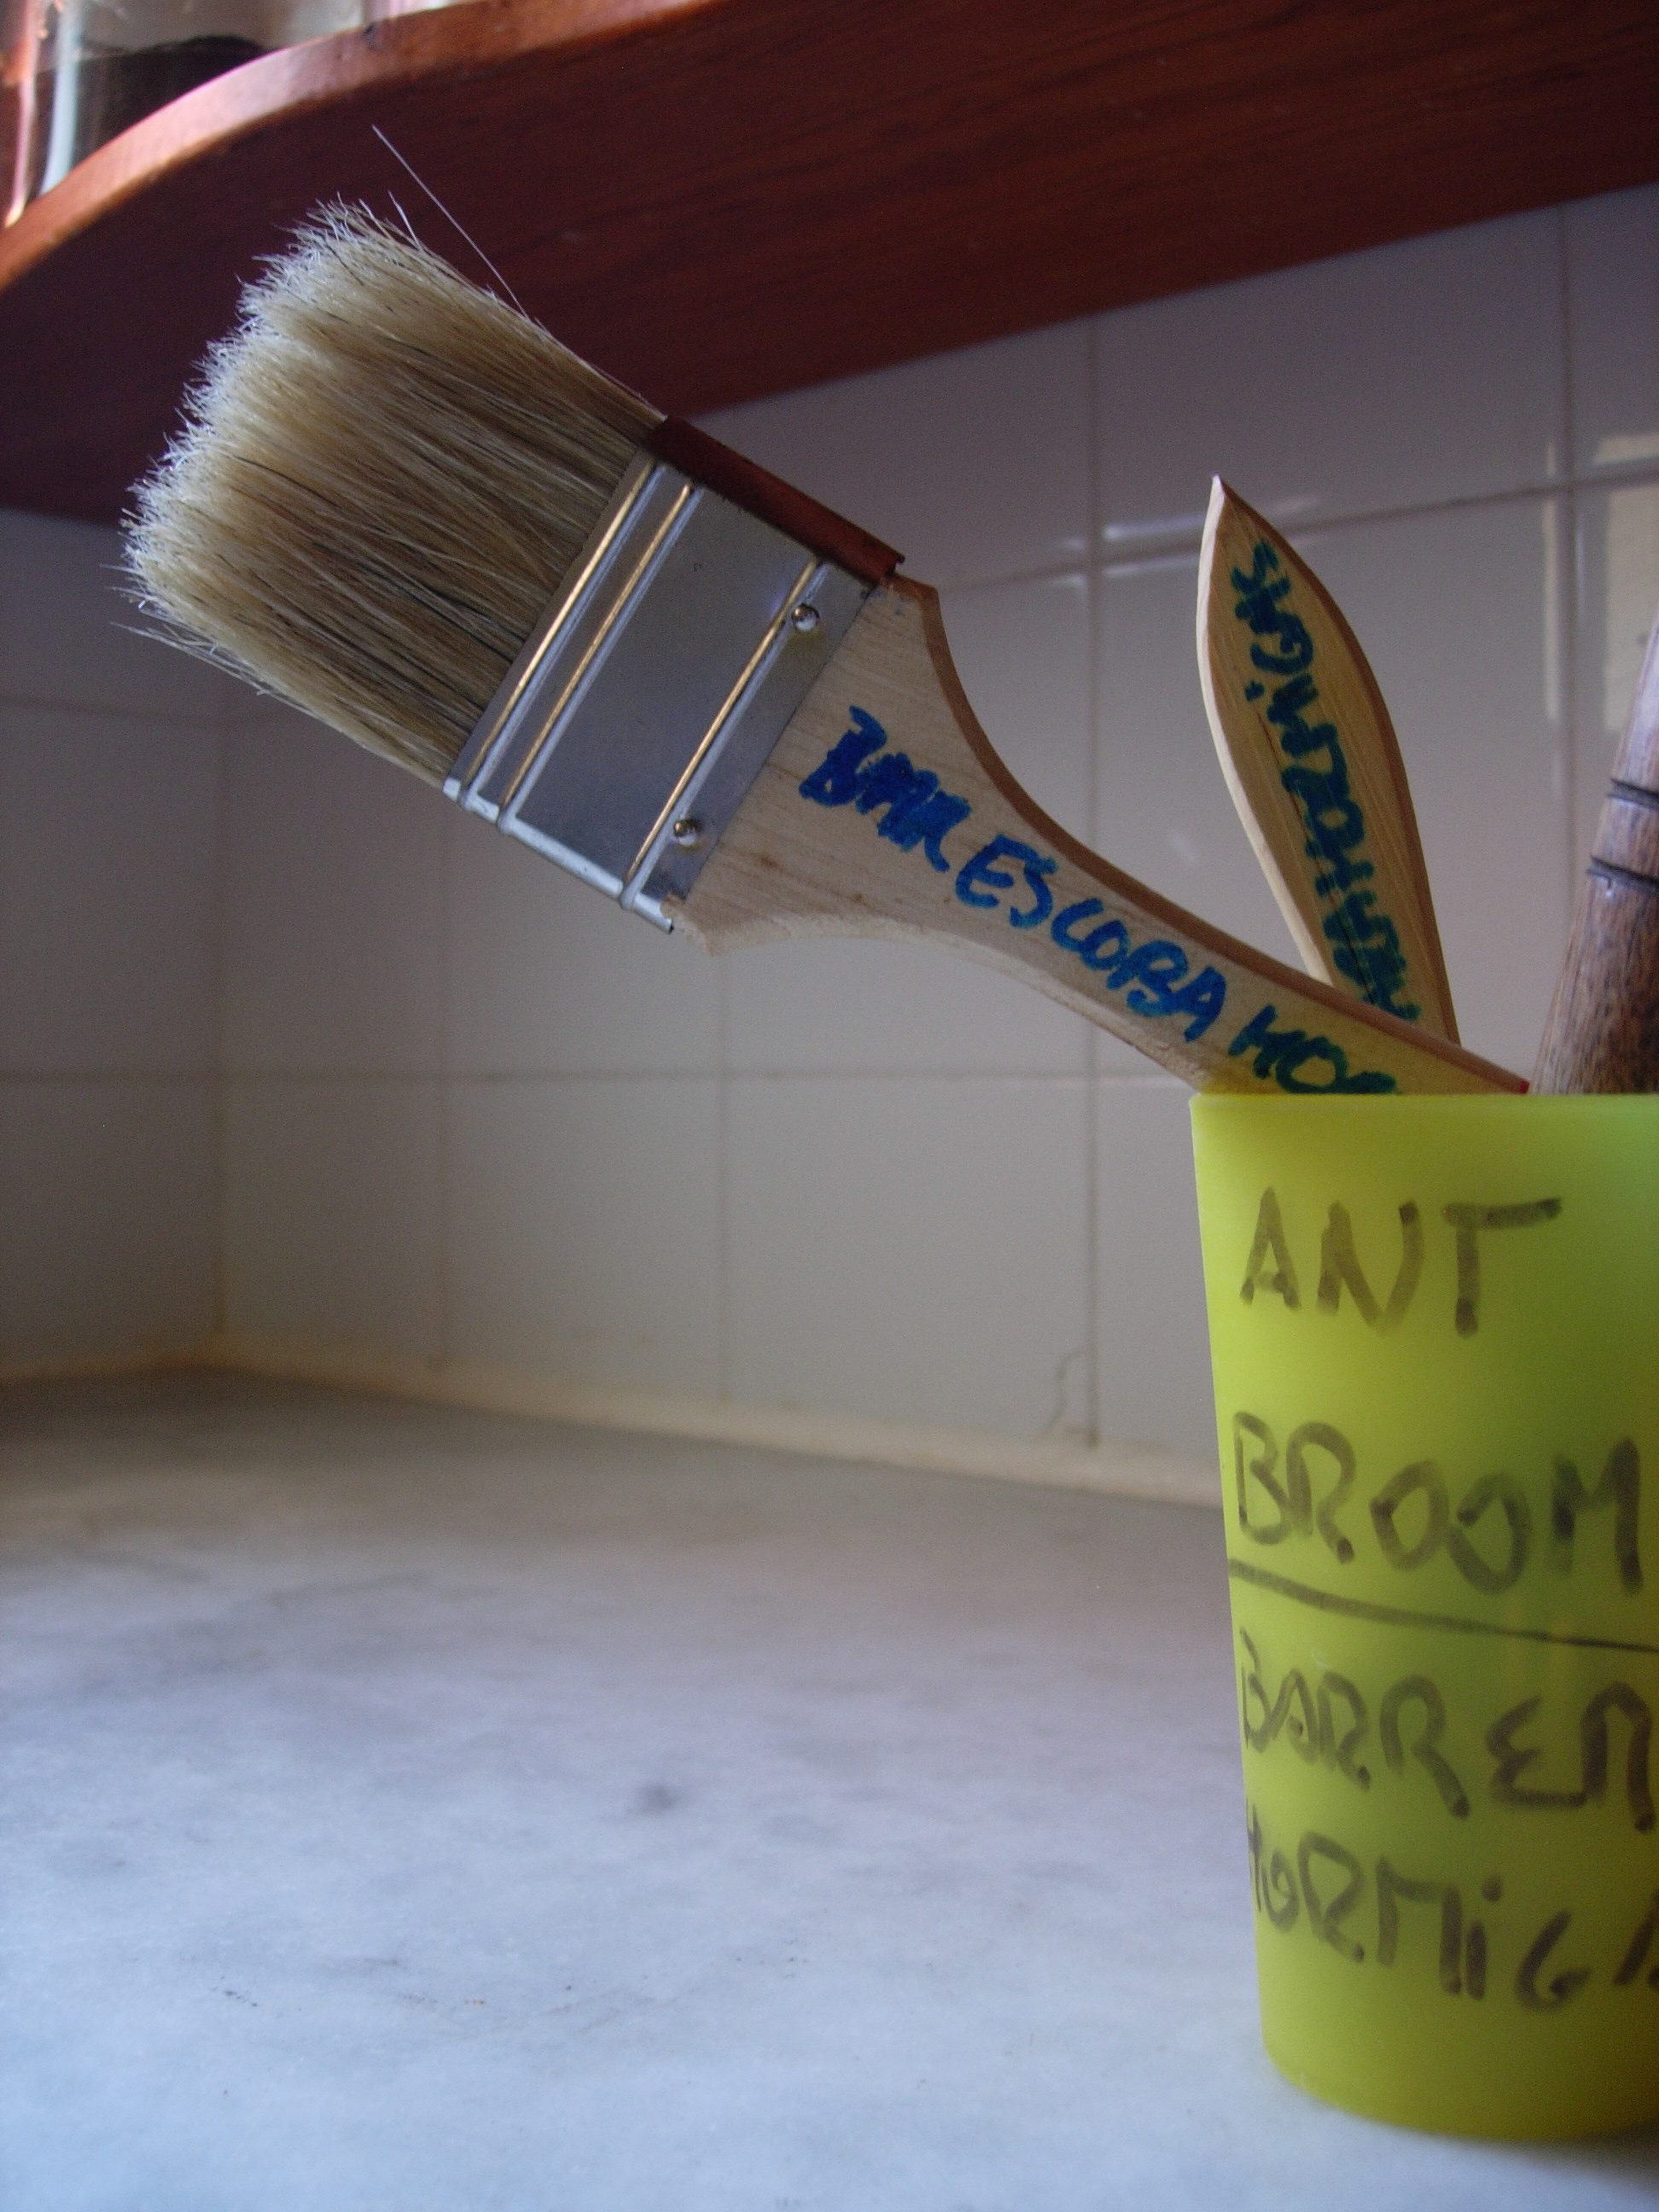 "Non-harming + pest control = ""Escoba de Hormigas"":  Ant Broom."